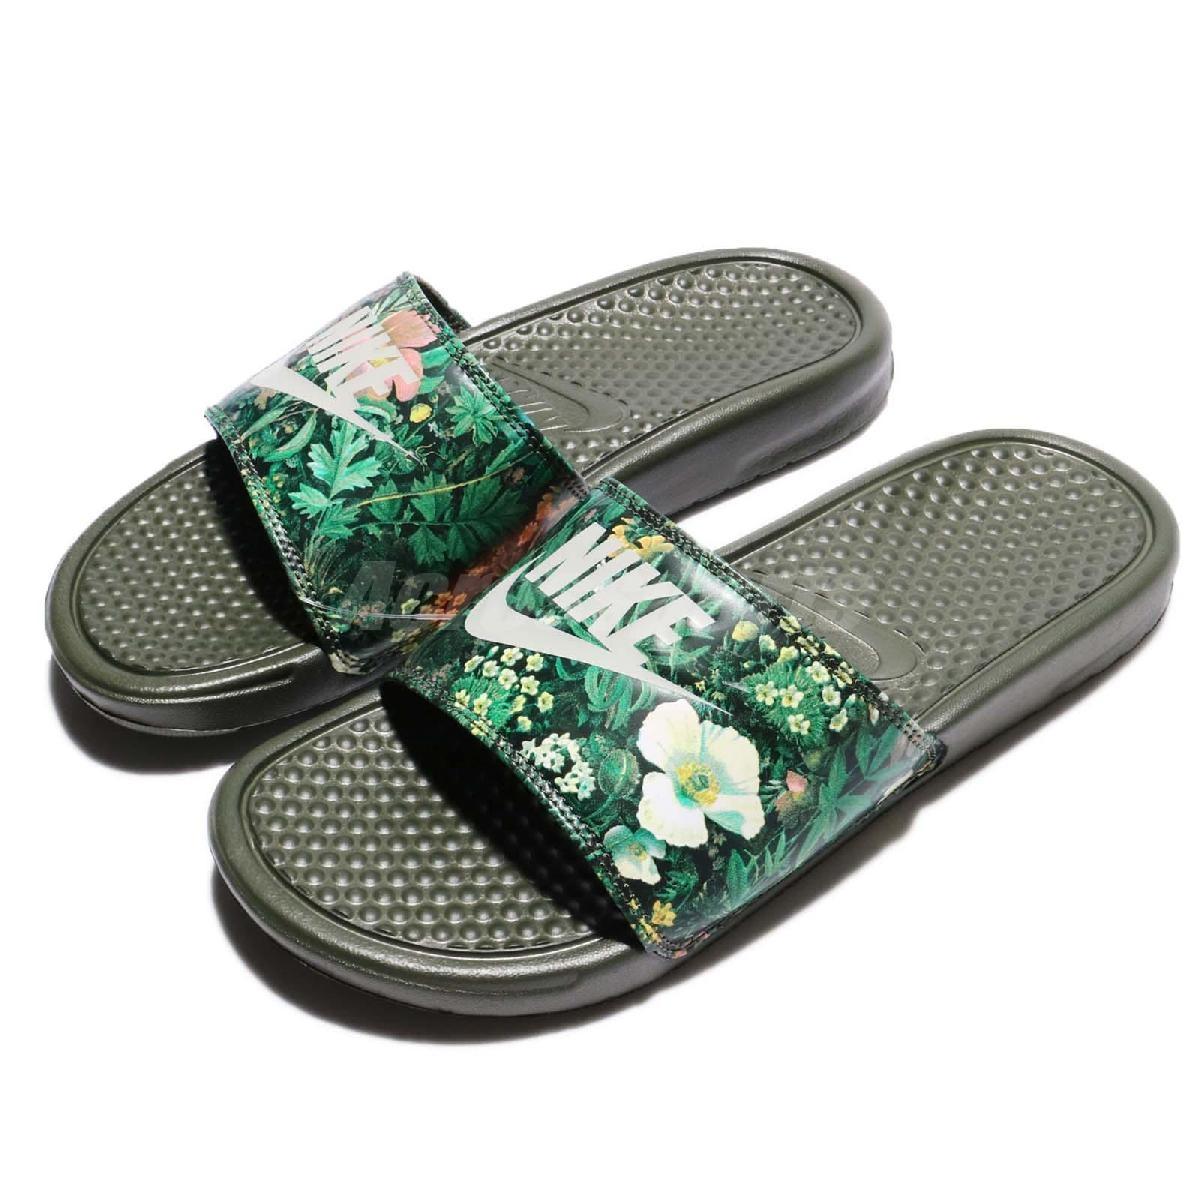 Nike拖鞋Wmns Benassi JDI Print花花綠色花卉涼拖鞋女鞋PUMP306 618919-300